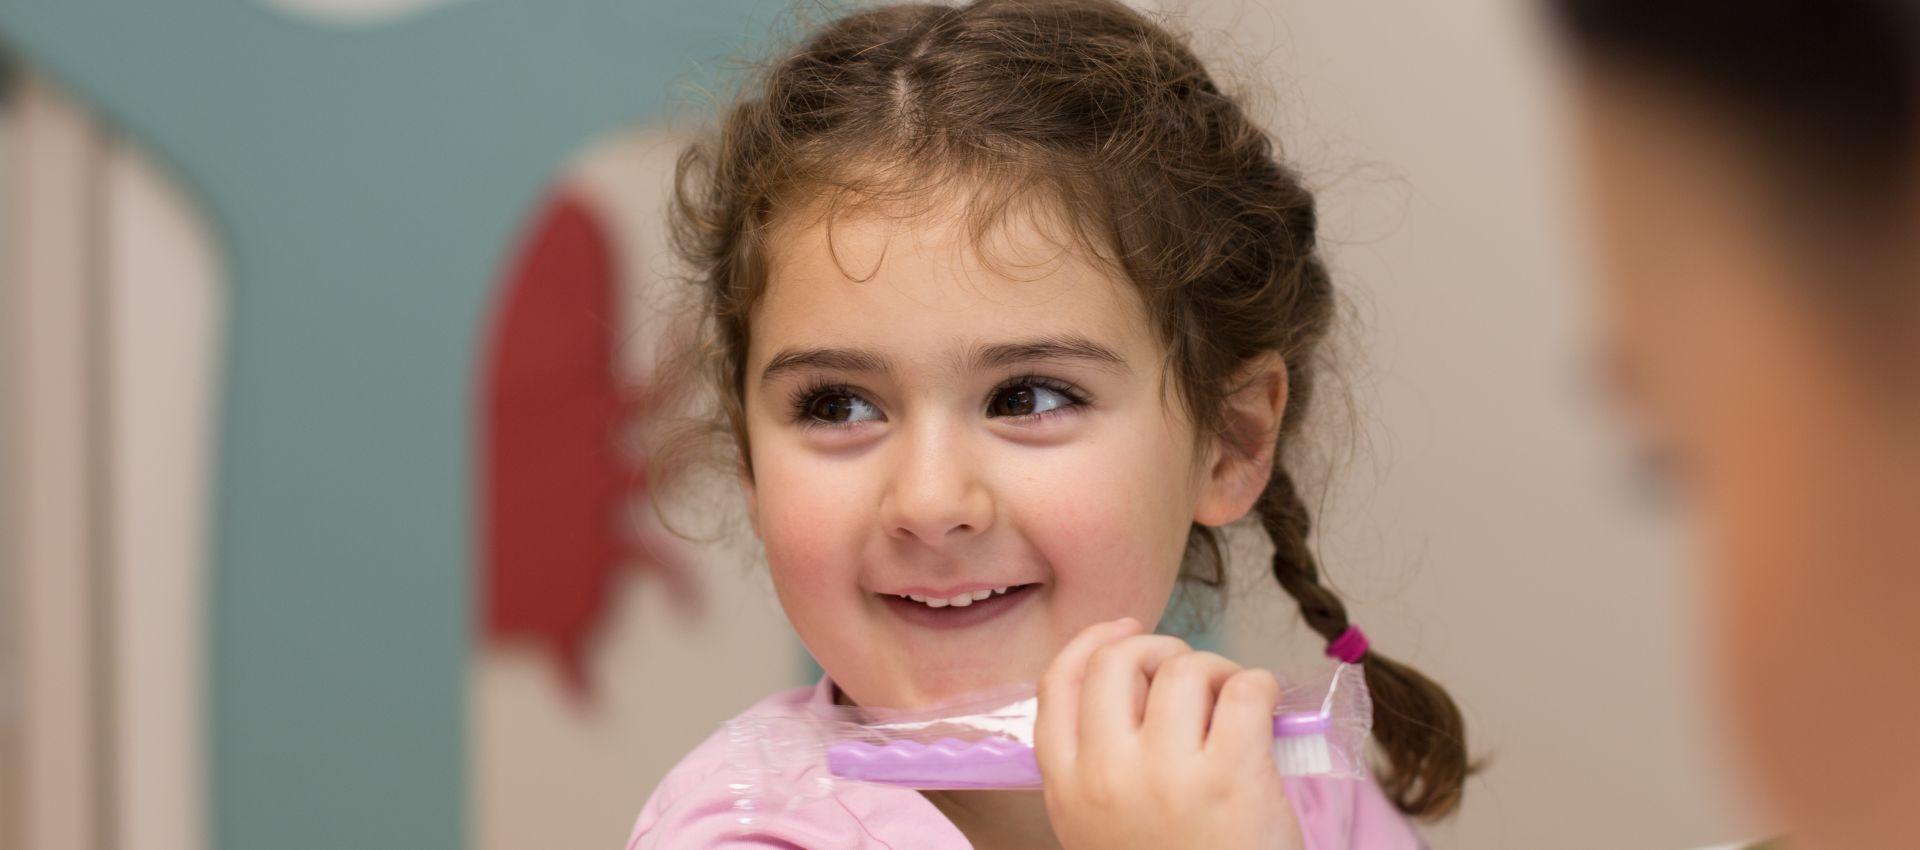 Kinderzahnarzt - Behandlung